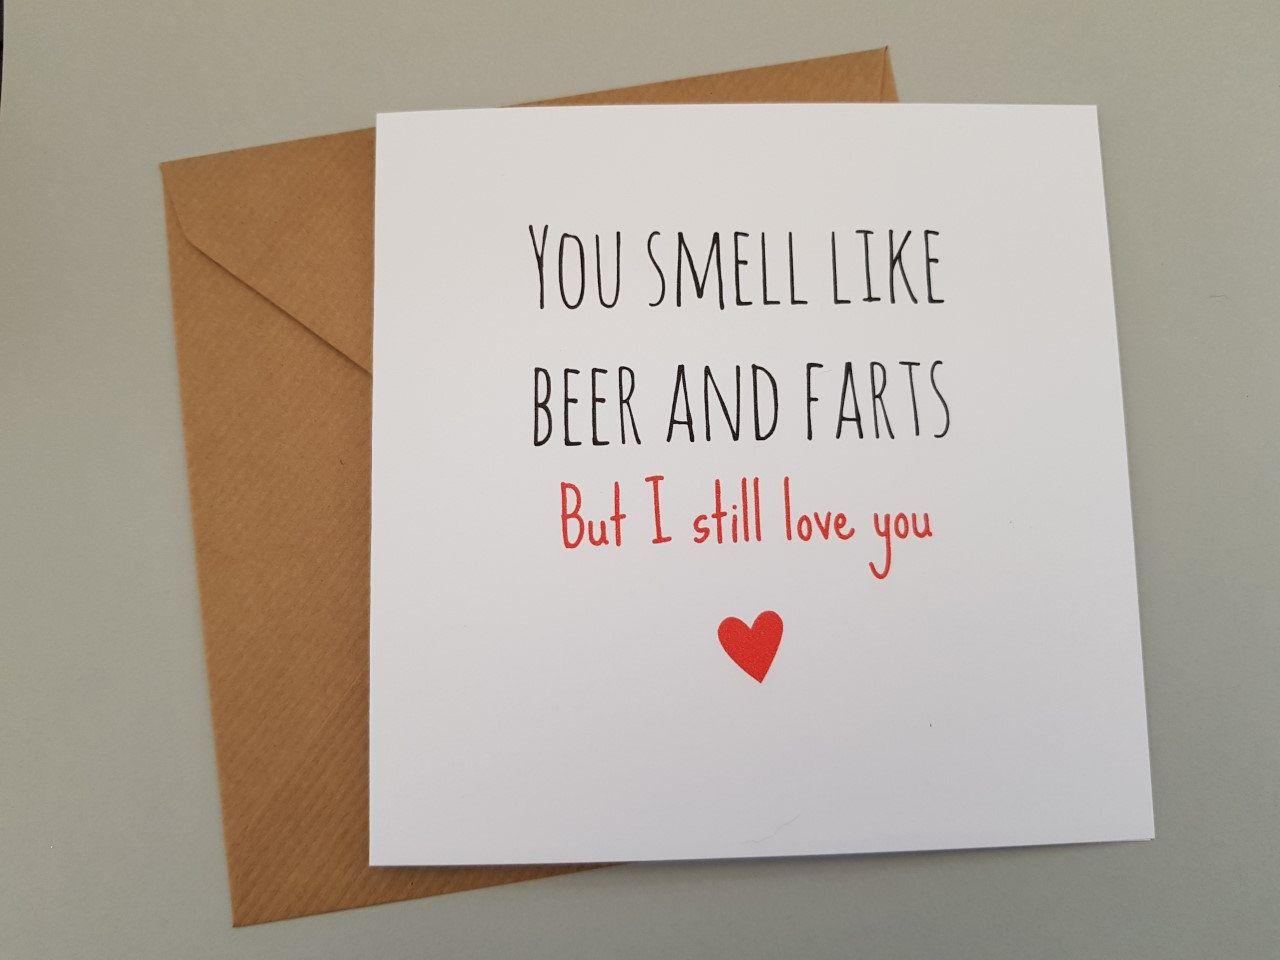 Funny Rude Cheeky Humorous Anniversary Birthday Card Joke for Wife